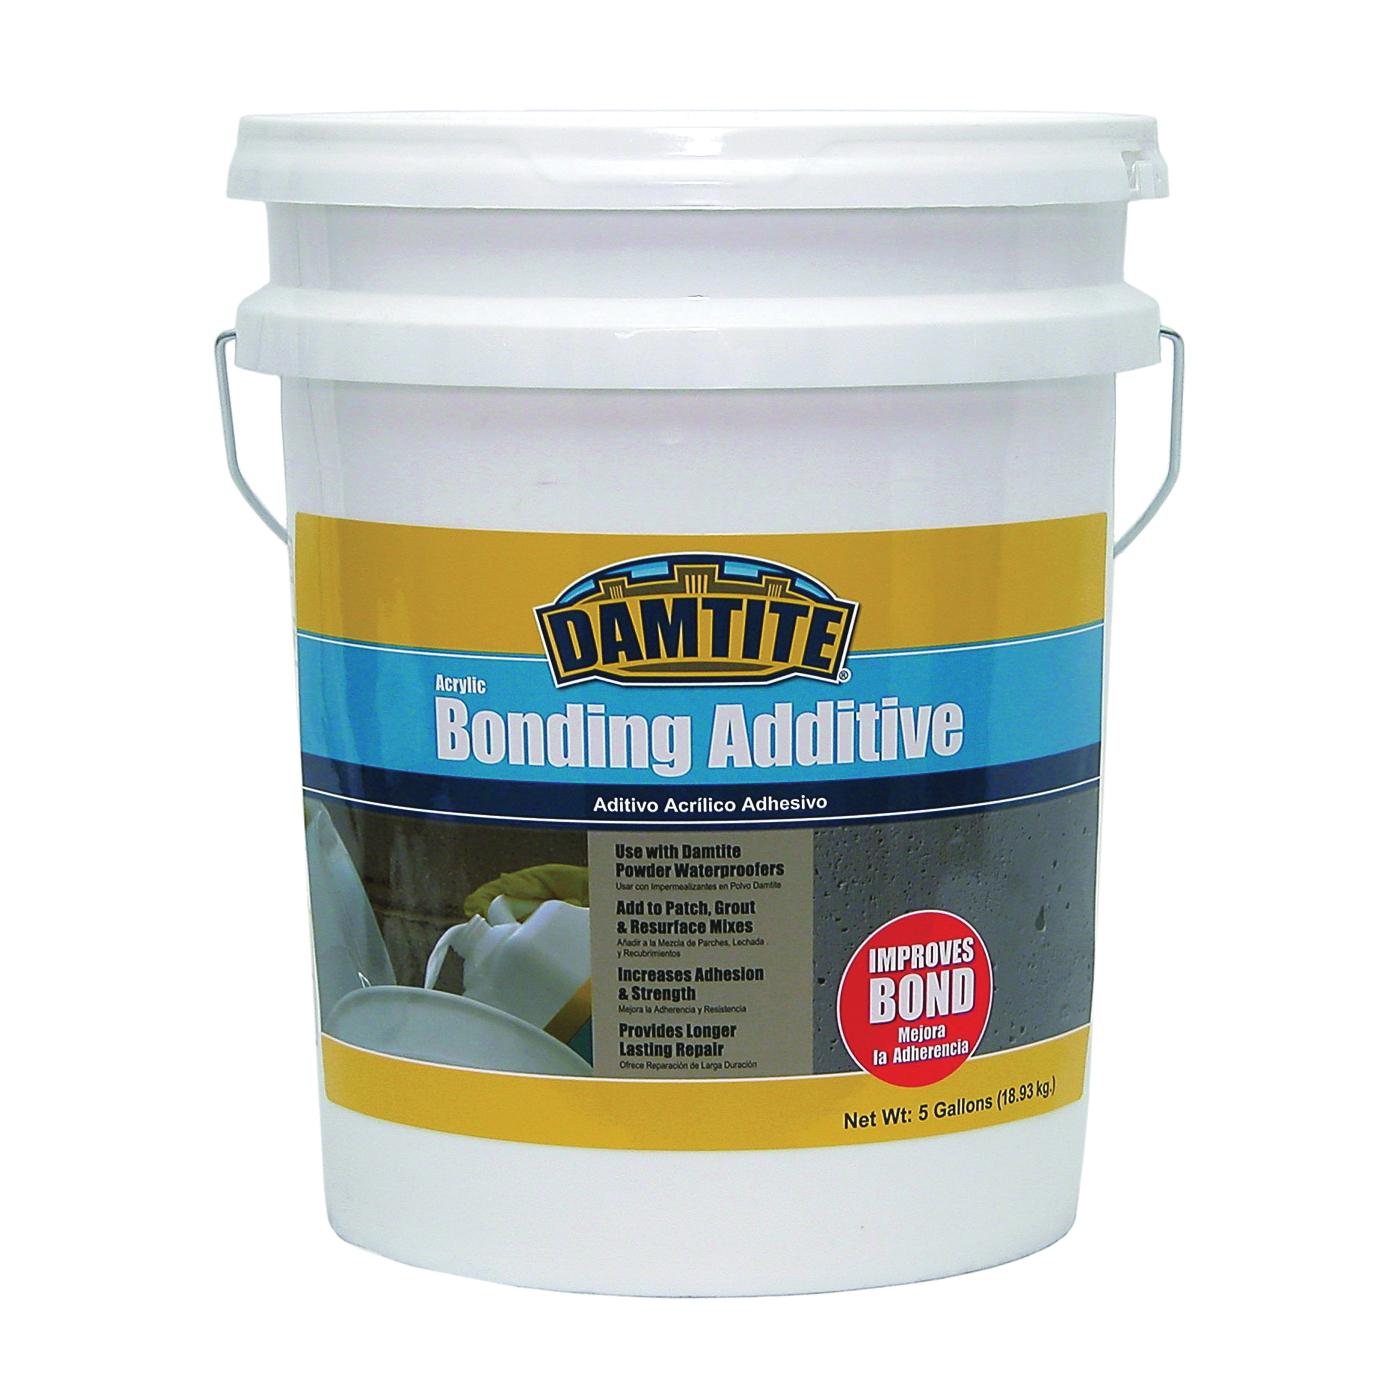 Picture of DAMTITE 05500 Bonding Additive, Liquid, Ammonia, White, 5 gal Package, Pail